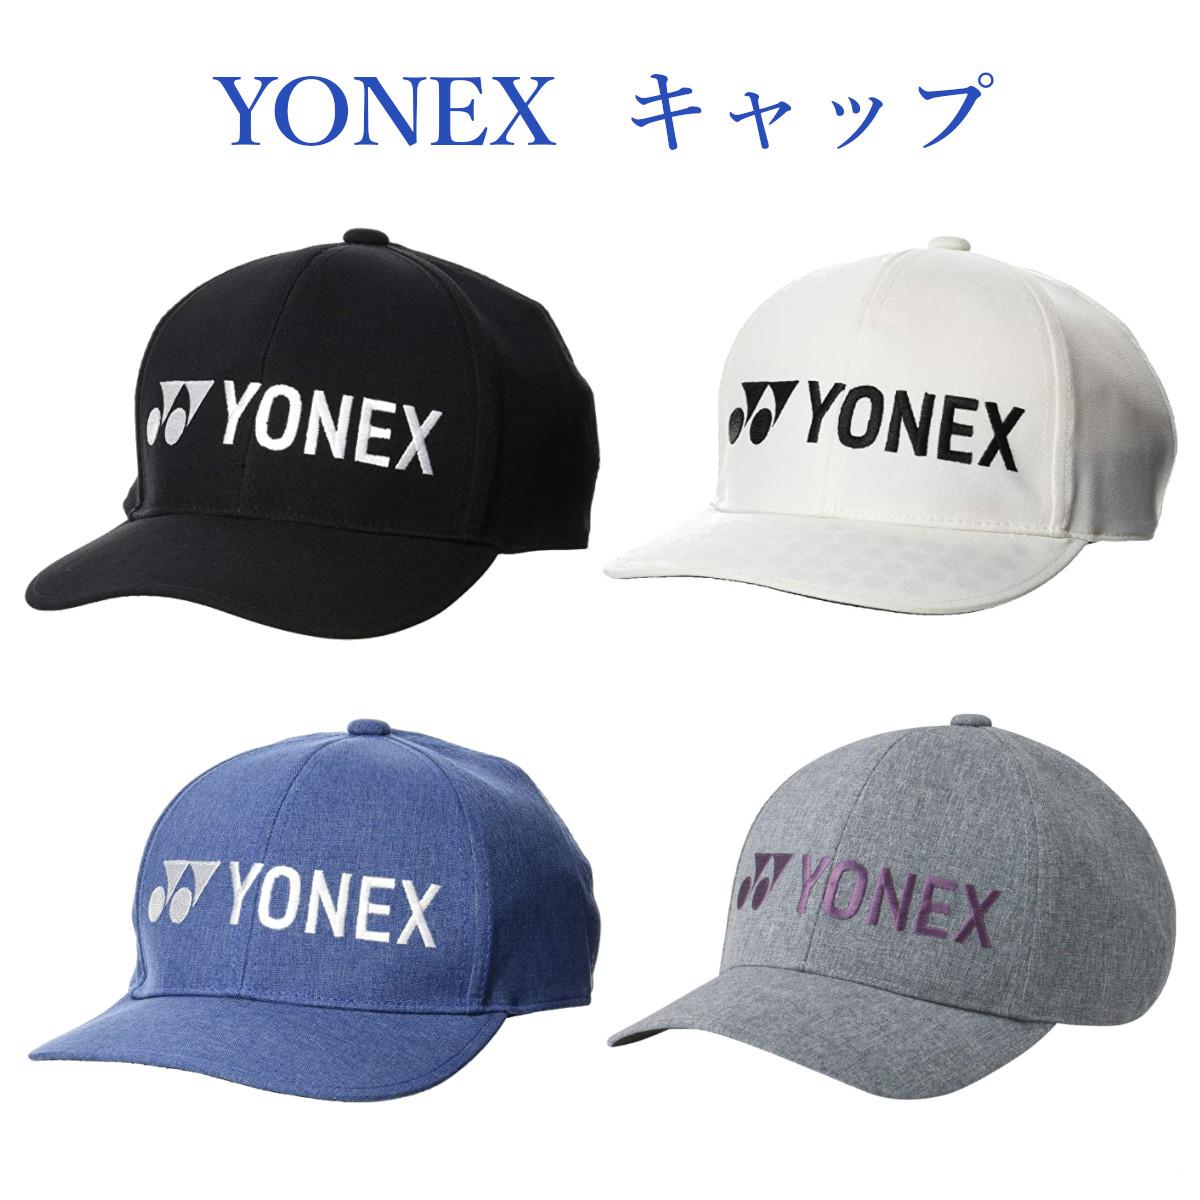 YONEX 帽子 日よけ 熱中症対策 男女兼用 ヨネックス キャップ 40063 メンズ ユニセックス 2020SS バドミントン テニス